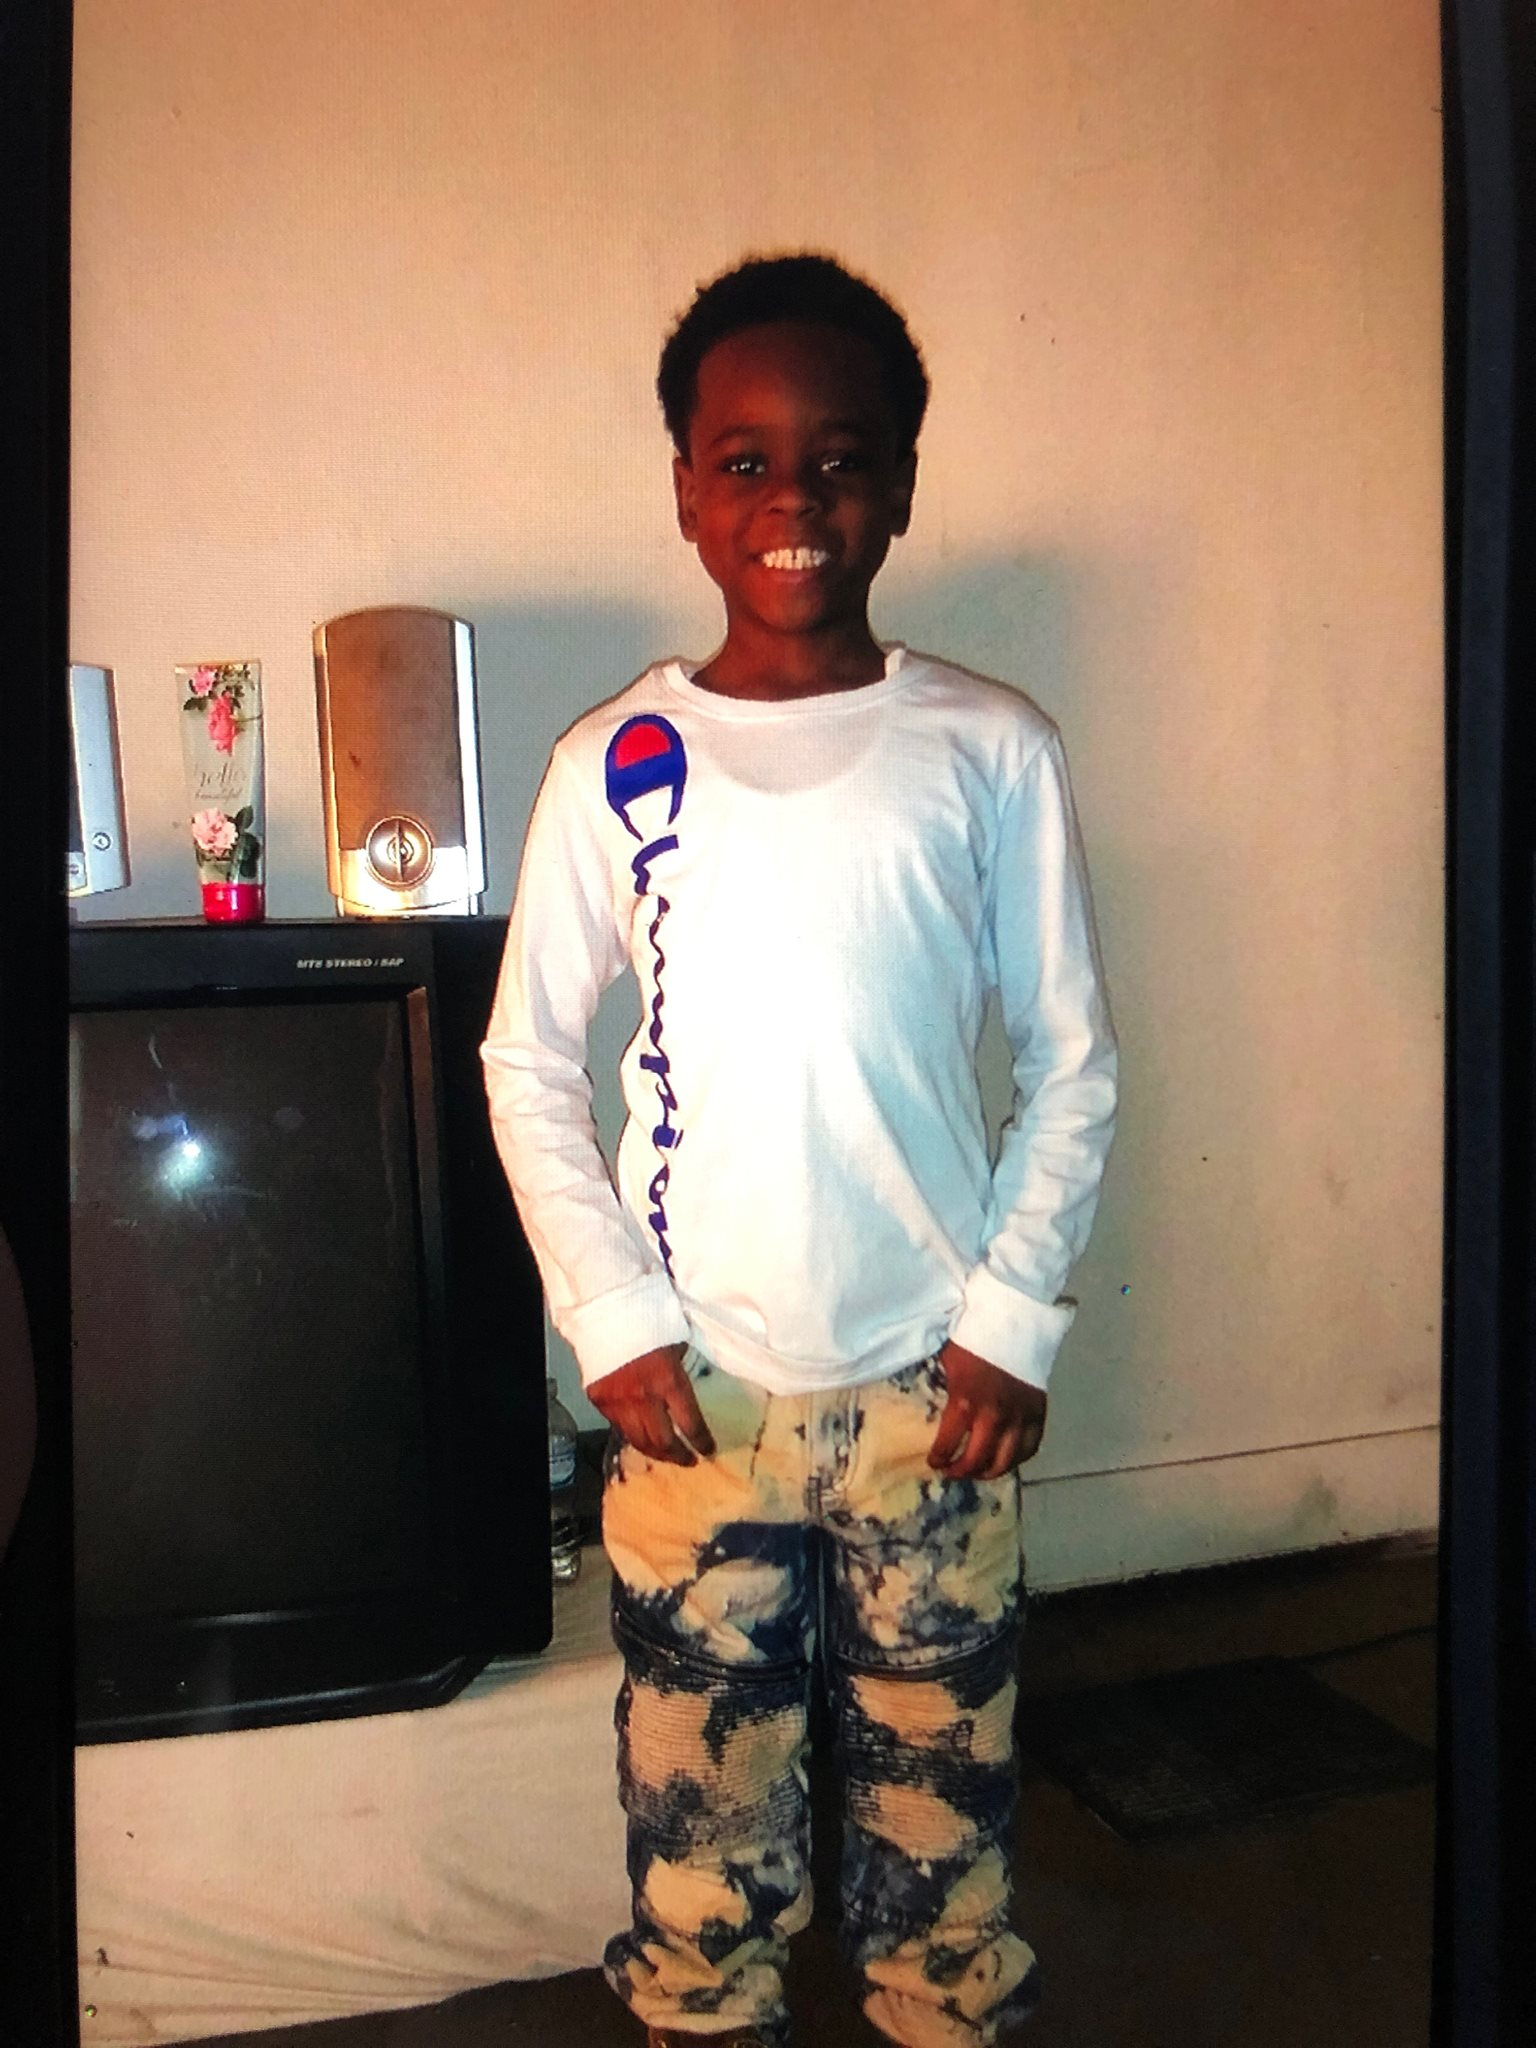 Flint police seek public's help to find missing 8-year-old